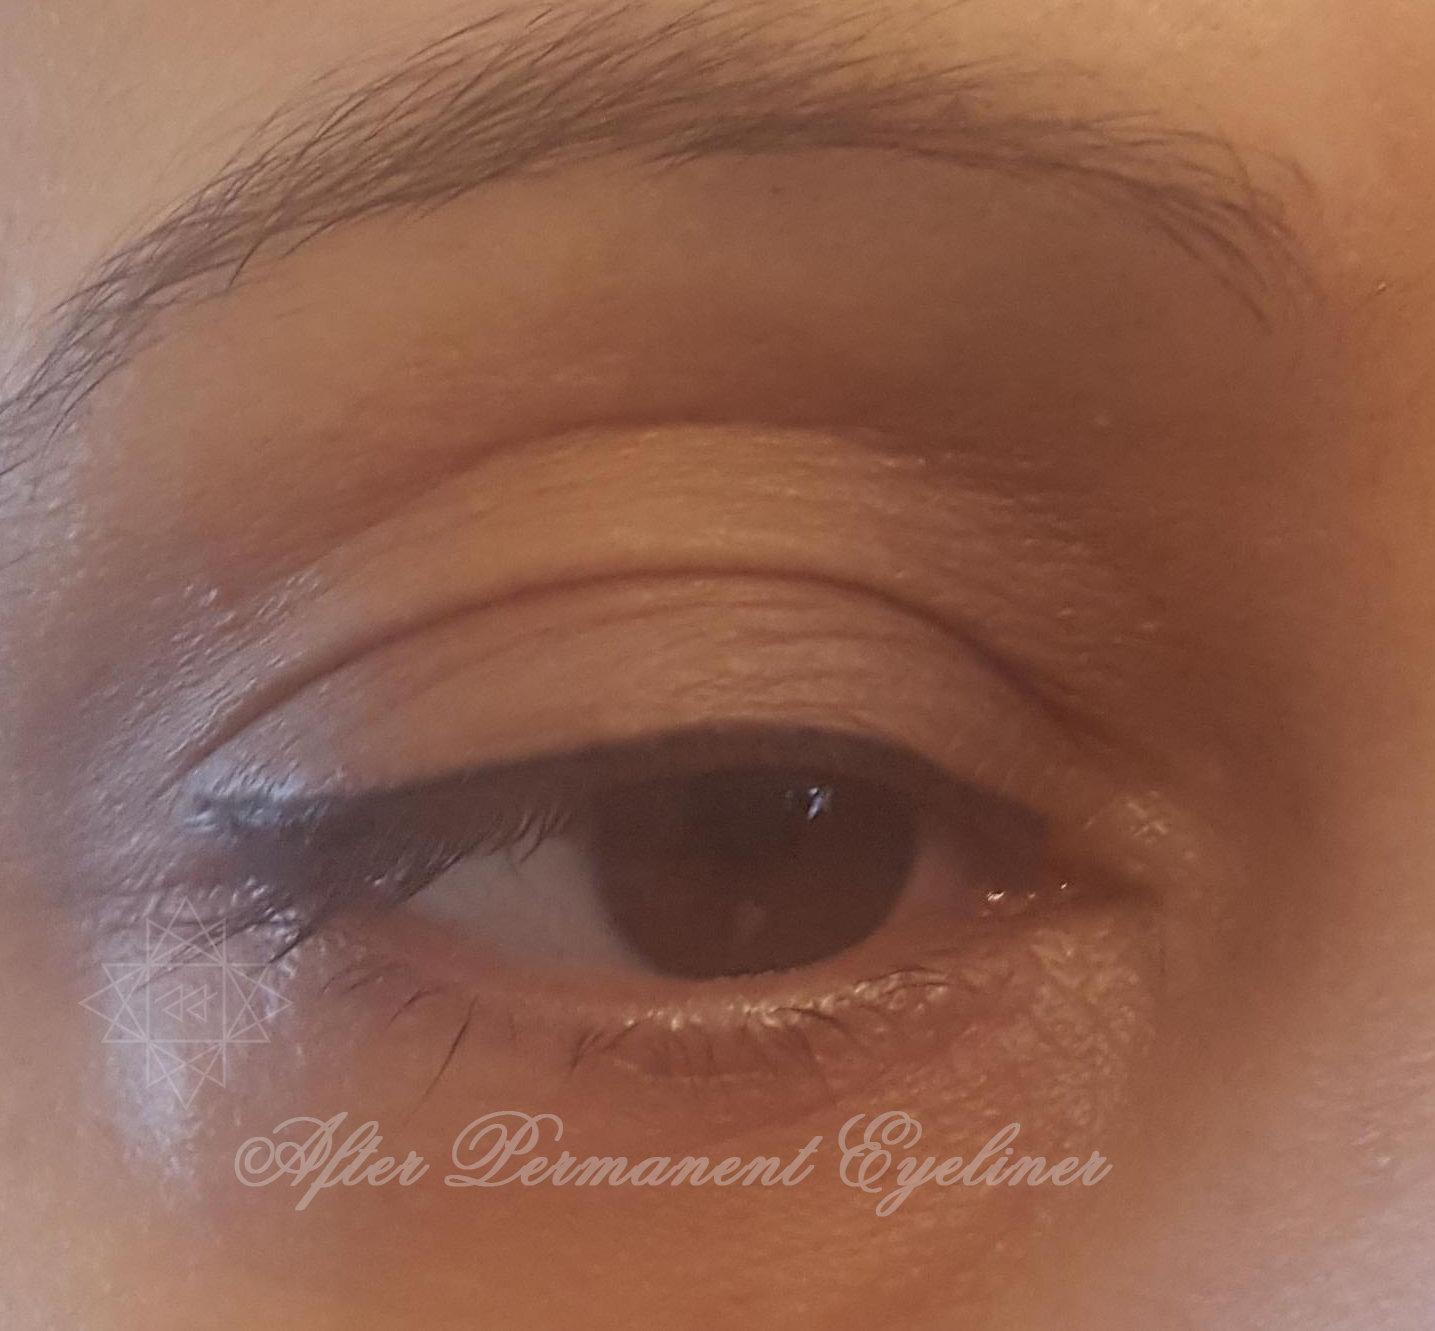 Permanent Eyeliner Upper-Session 1